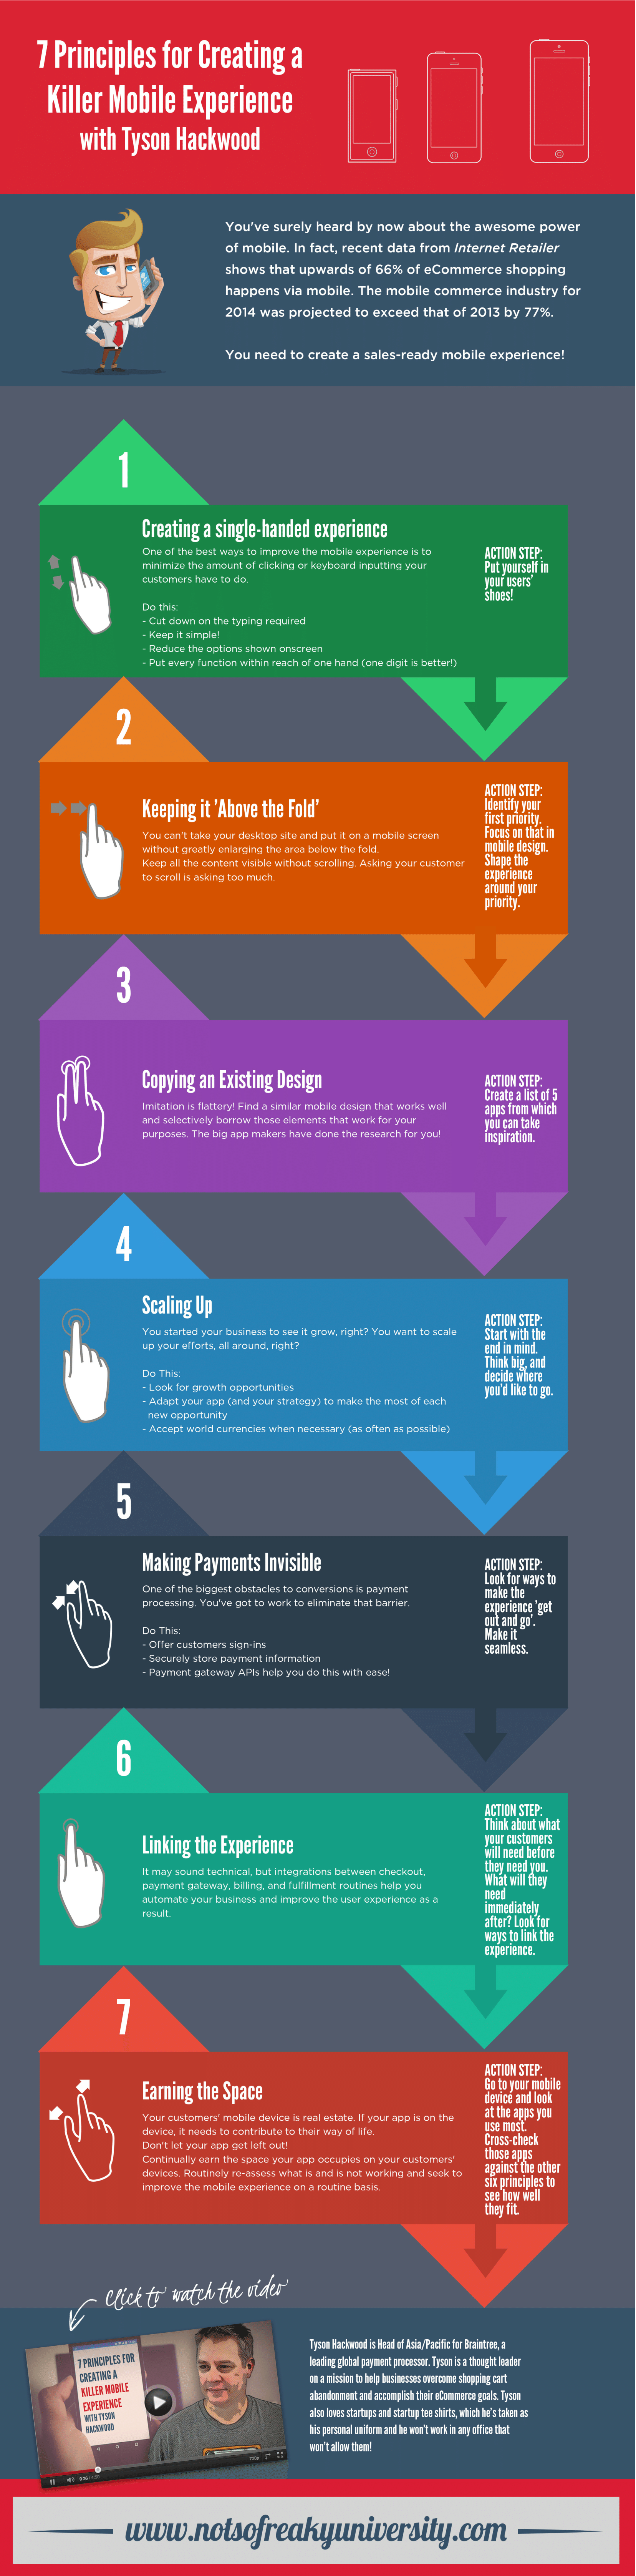 Tyson Hackwood Infographic